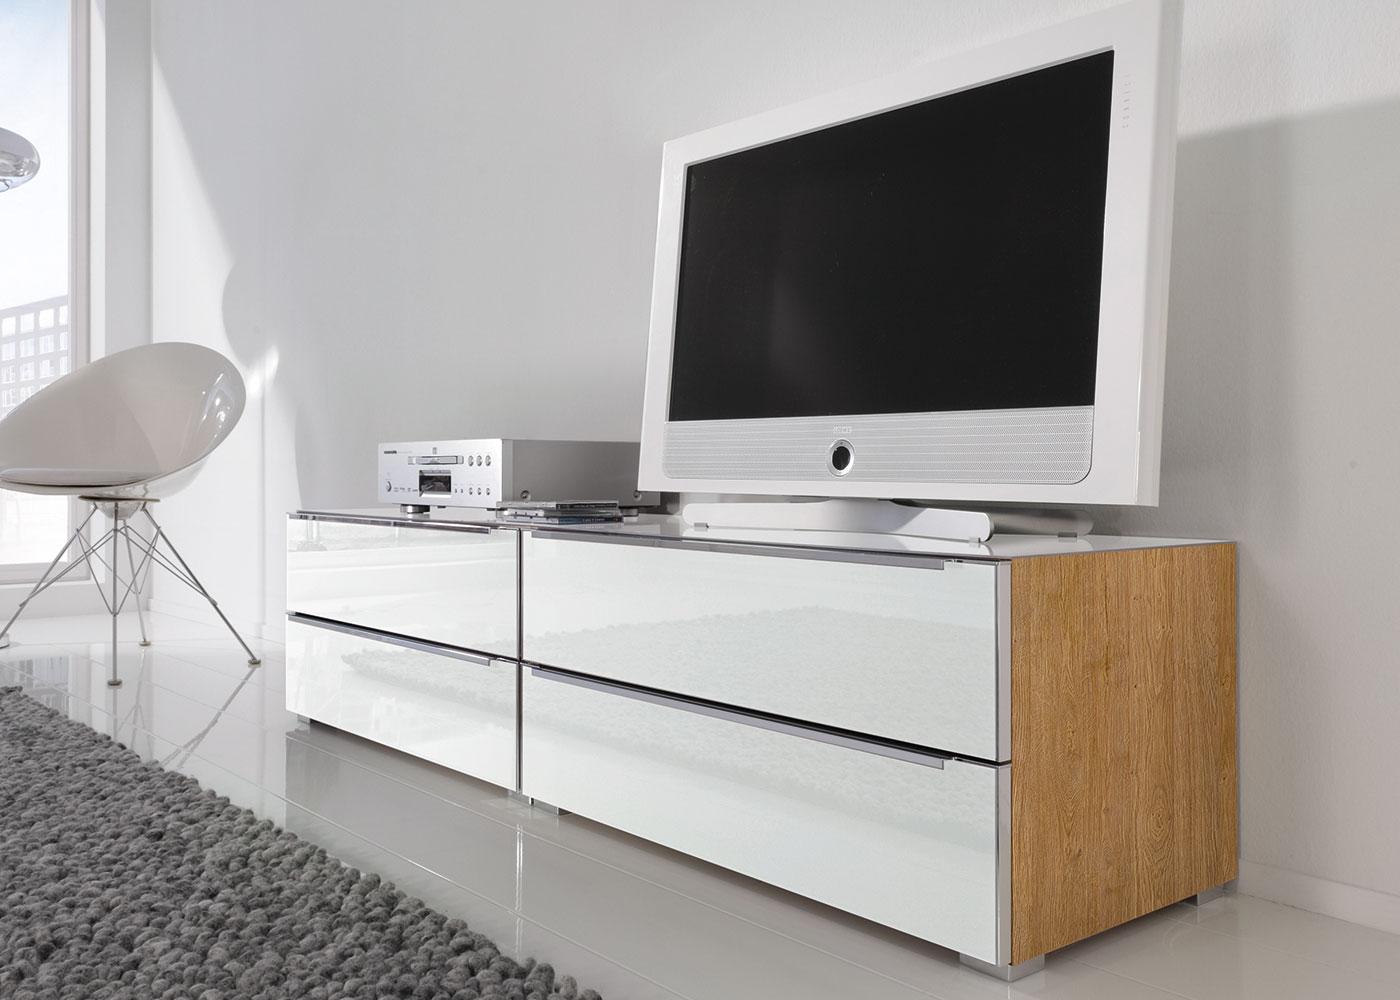 nolte mobel alegro style lowboard midfurn furniture superstore